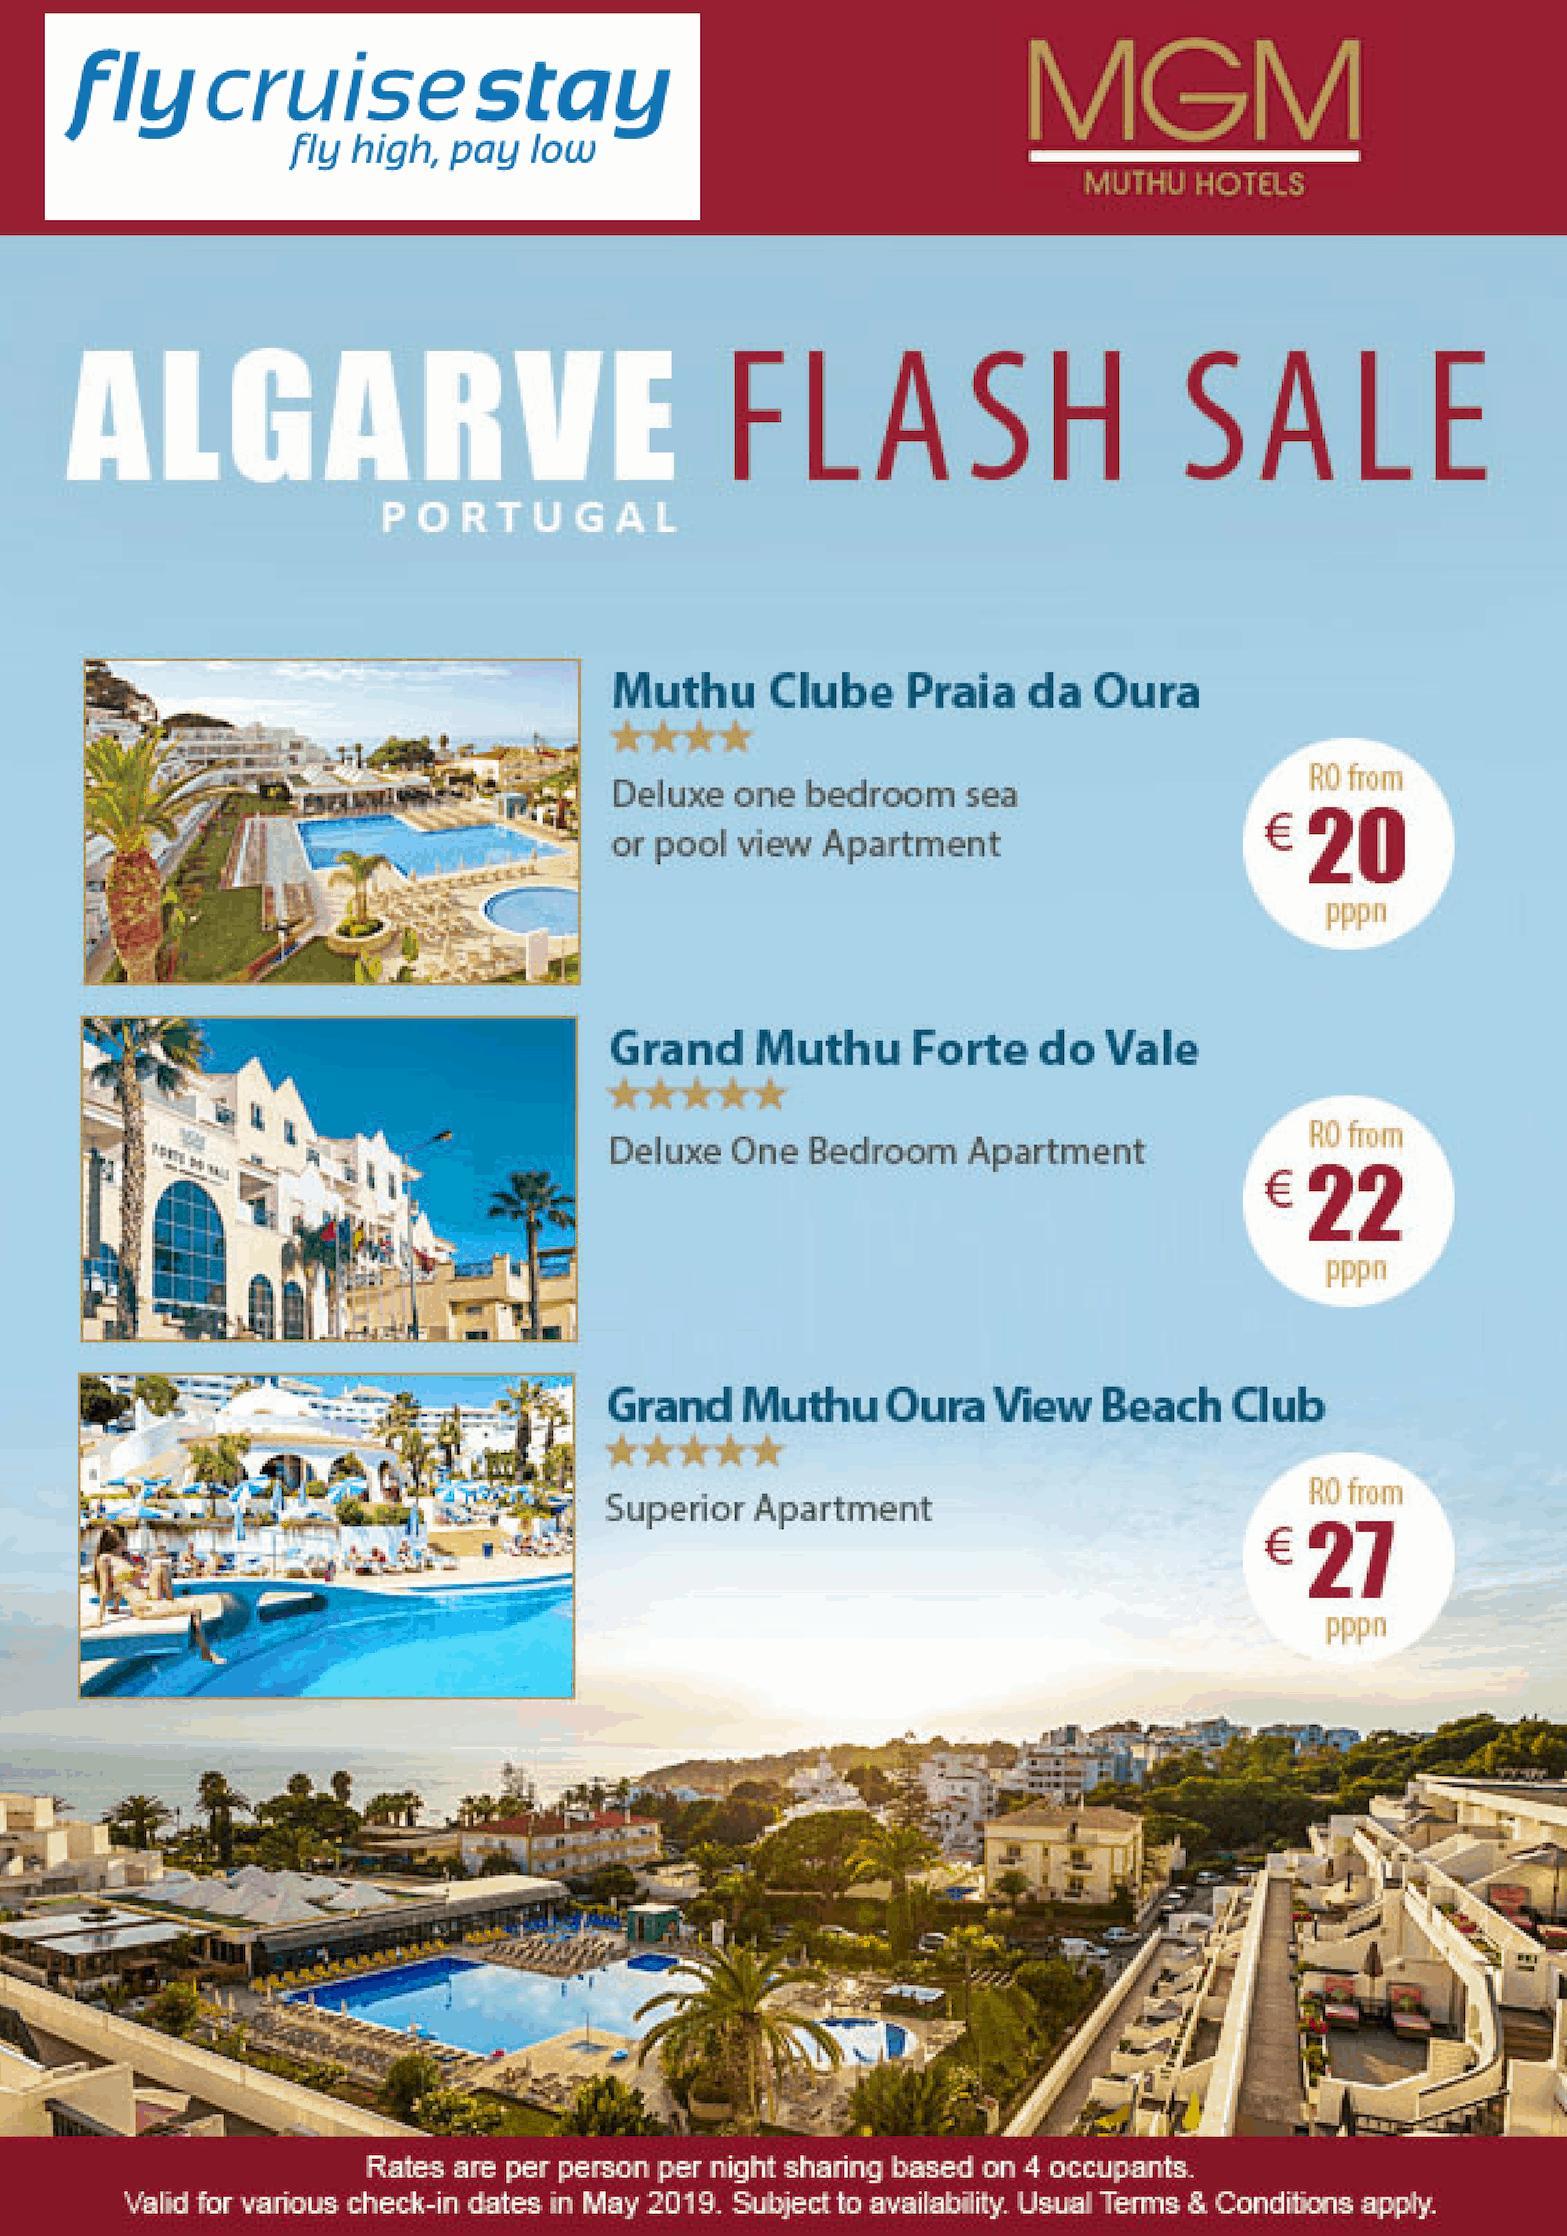 Muthu Hotels Algarve